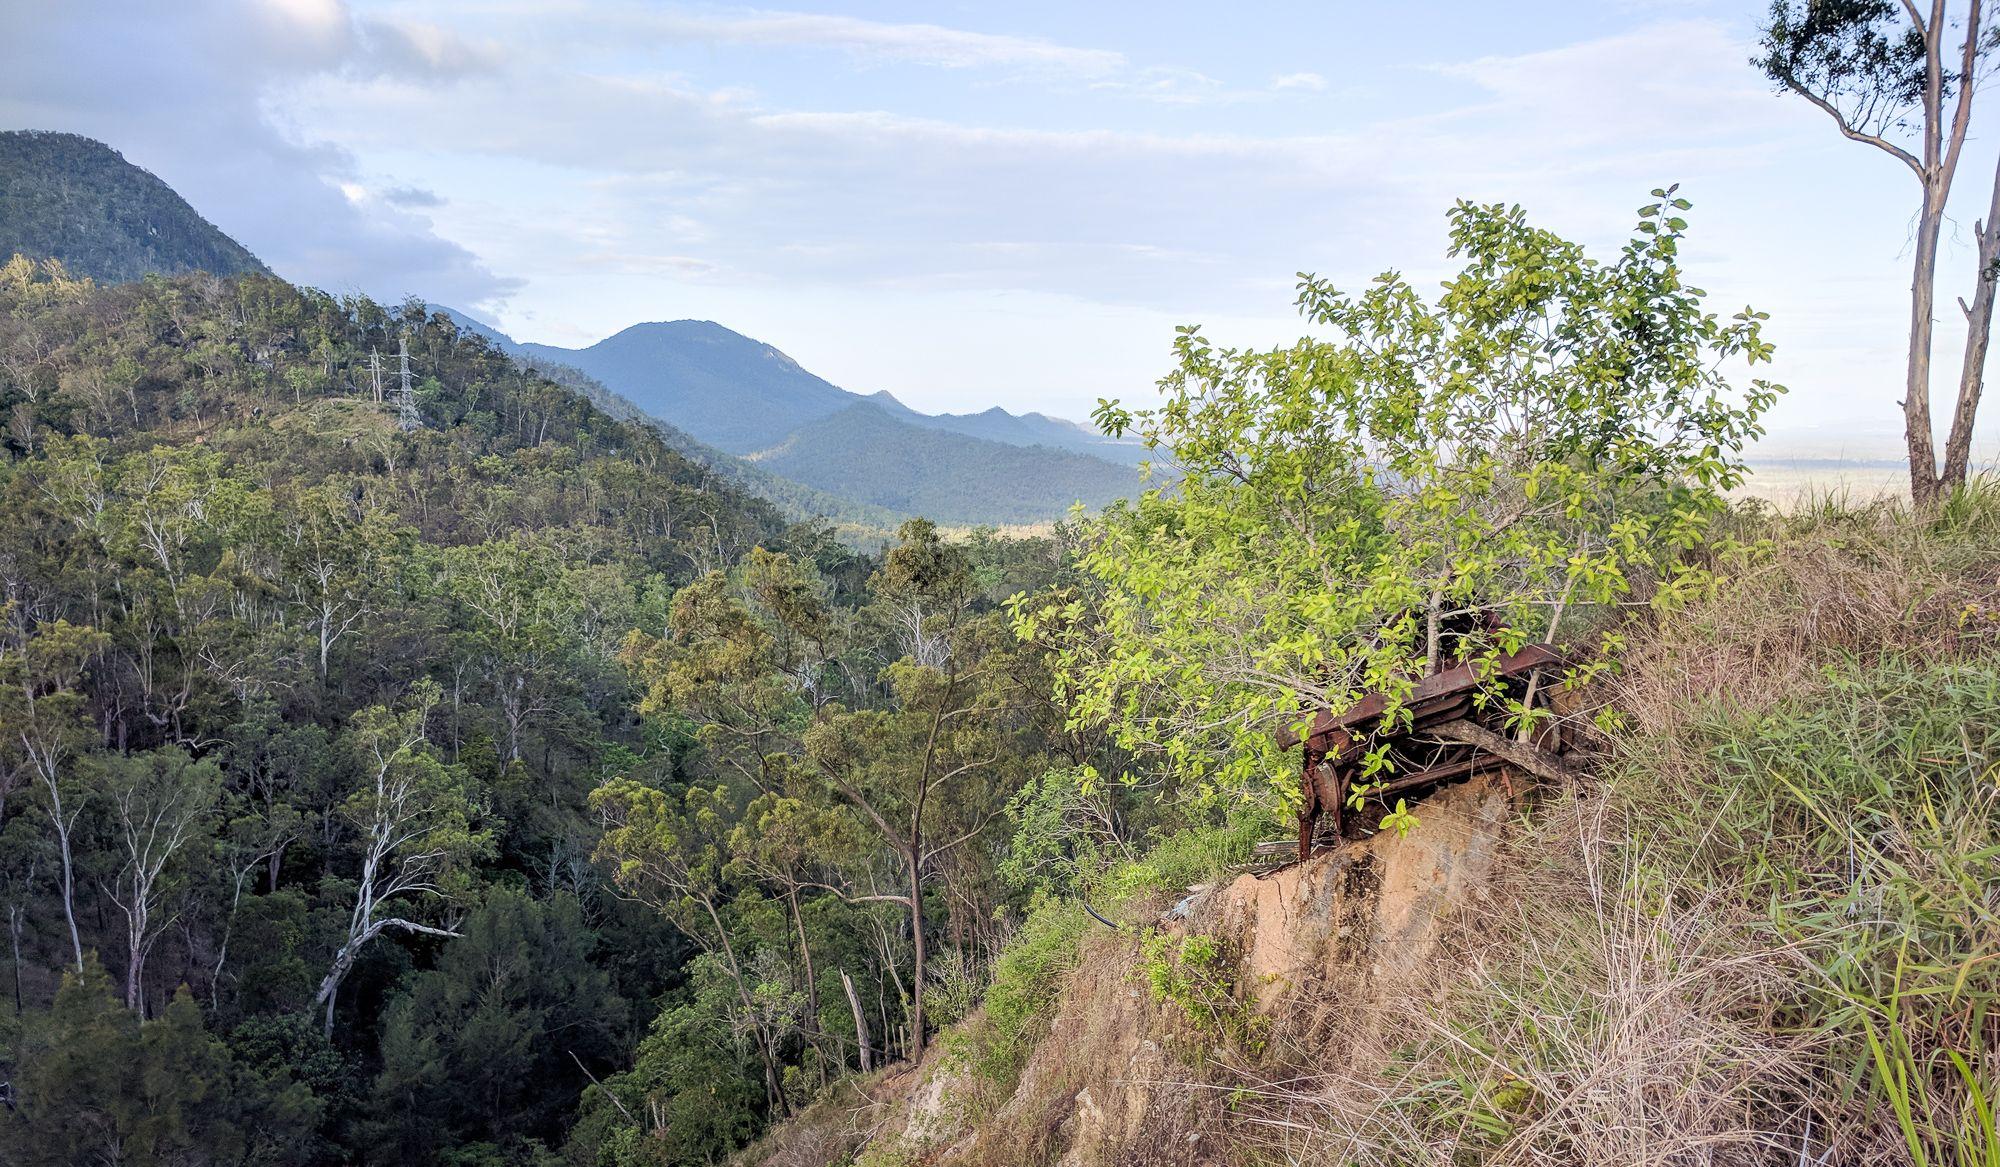 Hervey Range rusty car on hillside